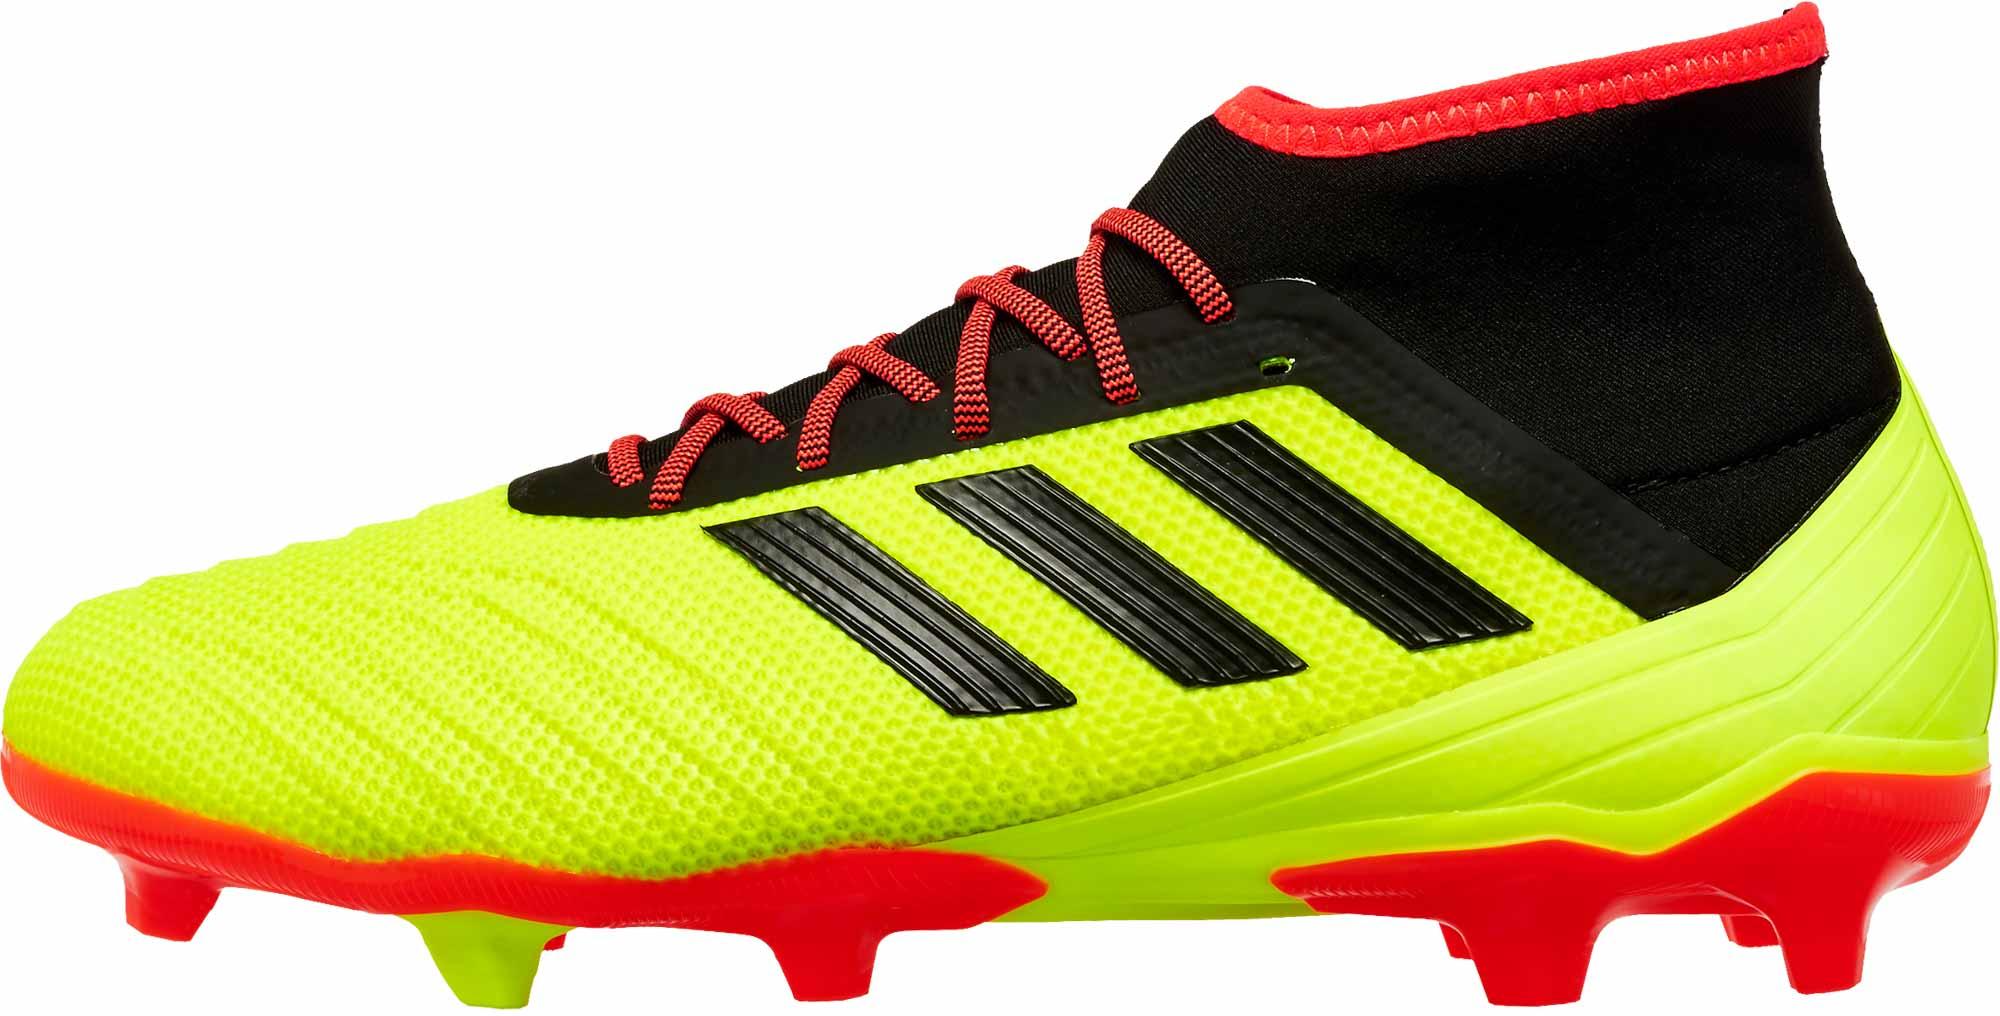 super cute new release latest design adidas Predator 18.2 FG - Solar Yellow/Black/Solar Red - Soccer Master